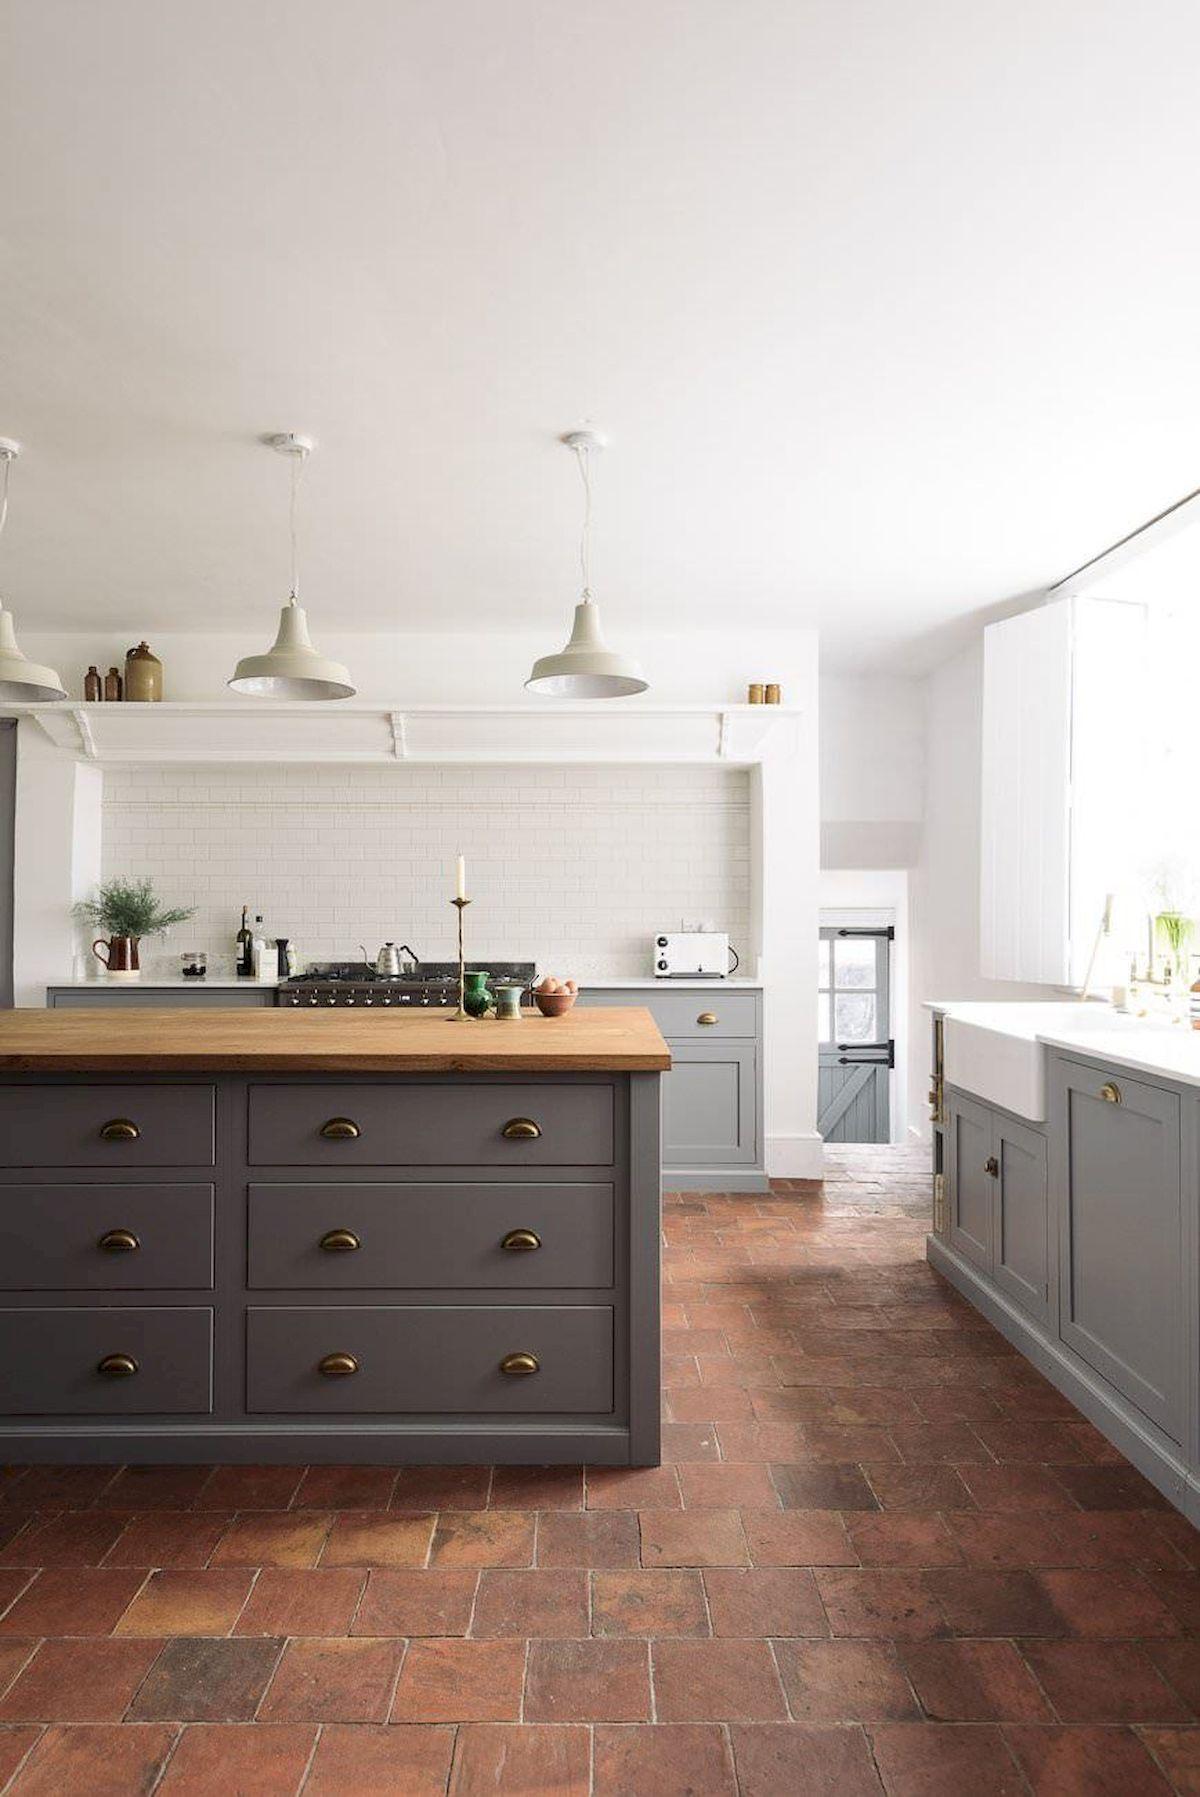 Adorable Kitchen Floor Ideashttps//jihanshanum.com/kitchen floor ...